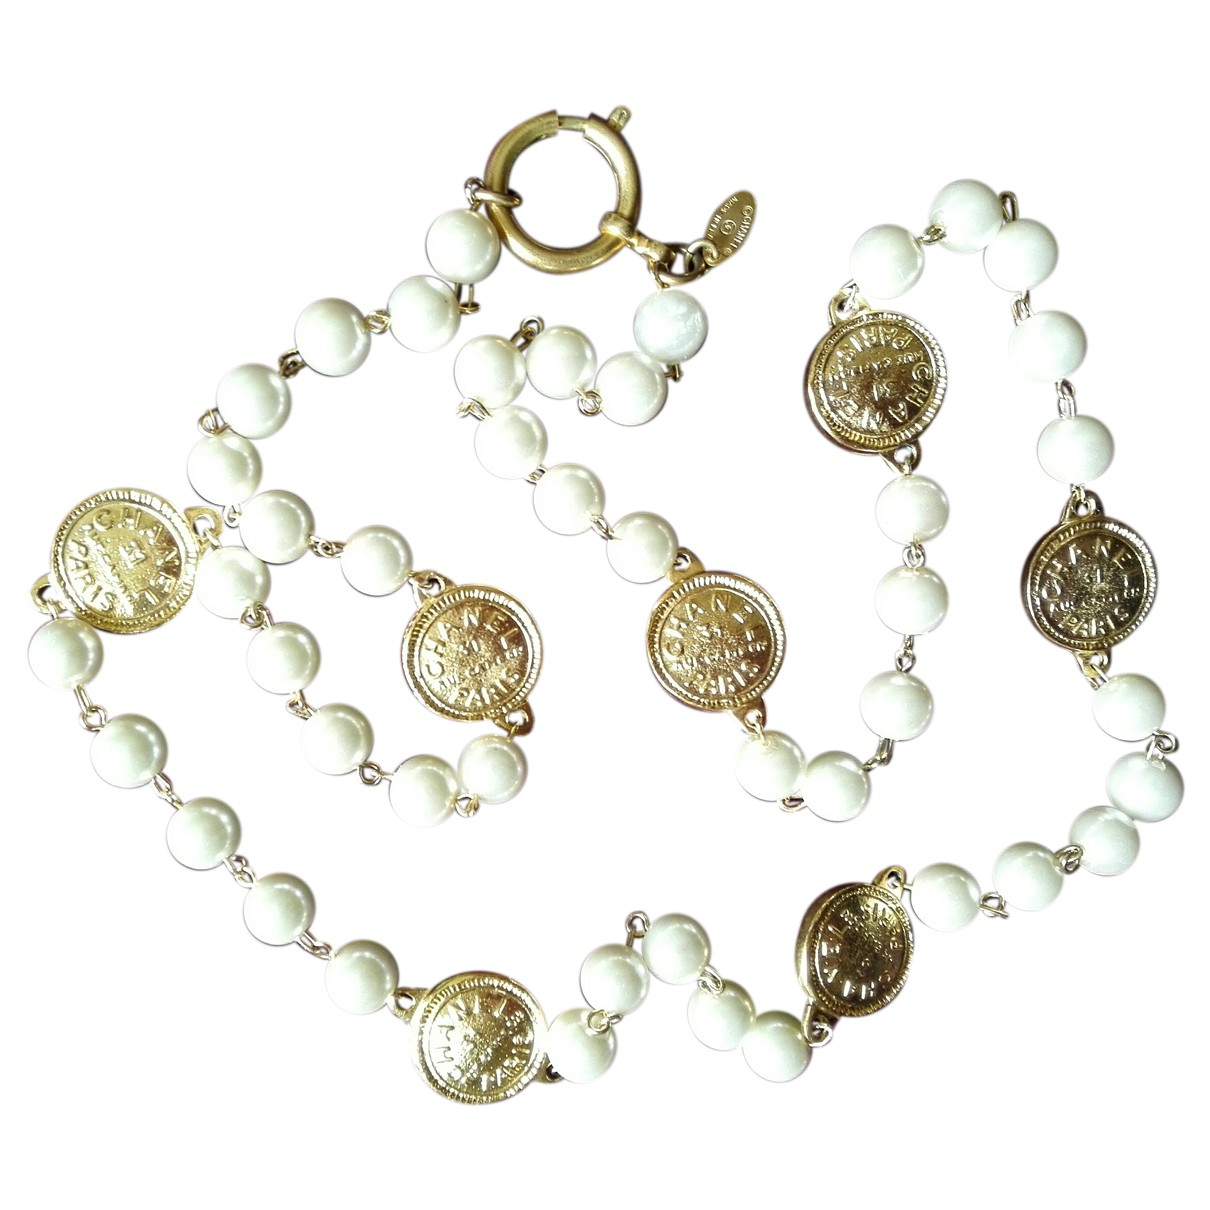 Chanel \N Halskette in  Weiss Perlen